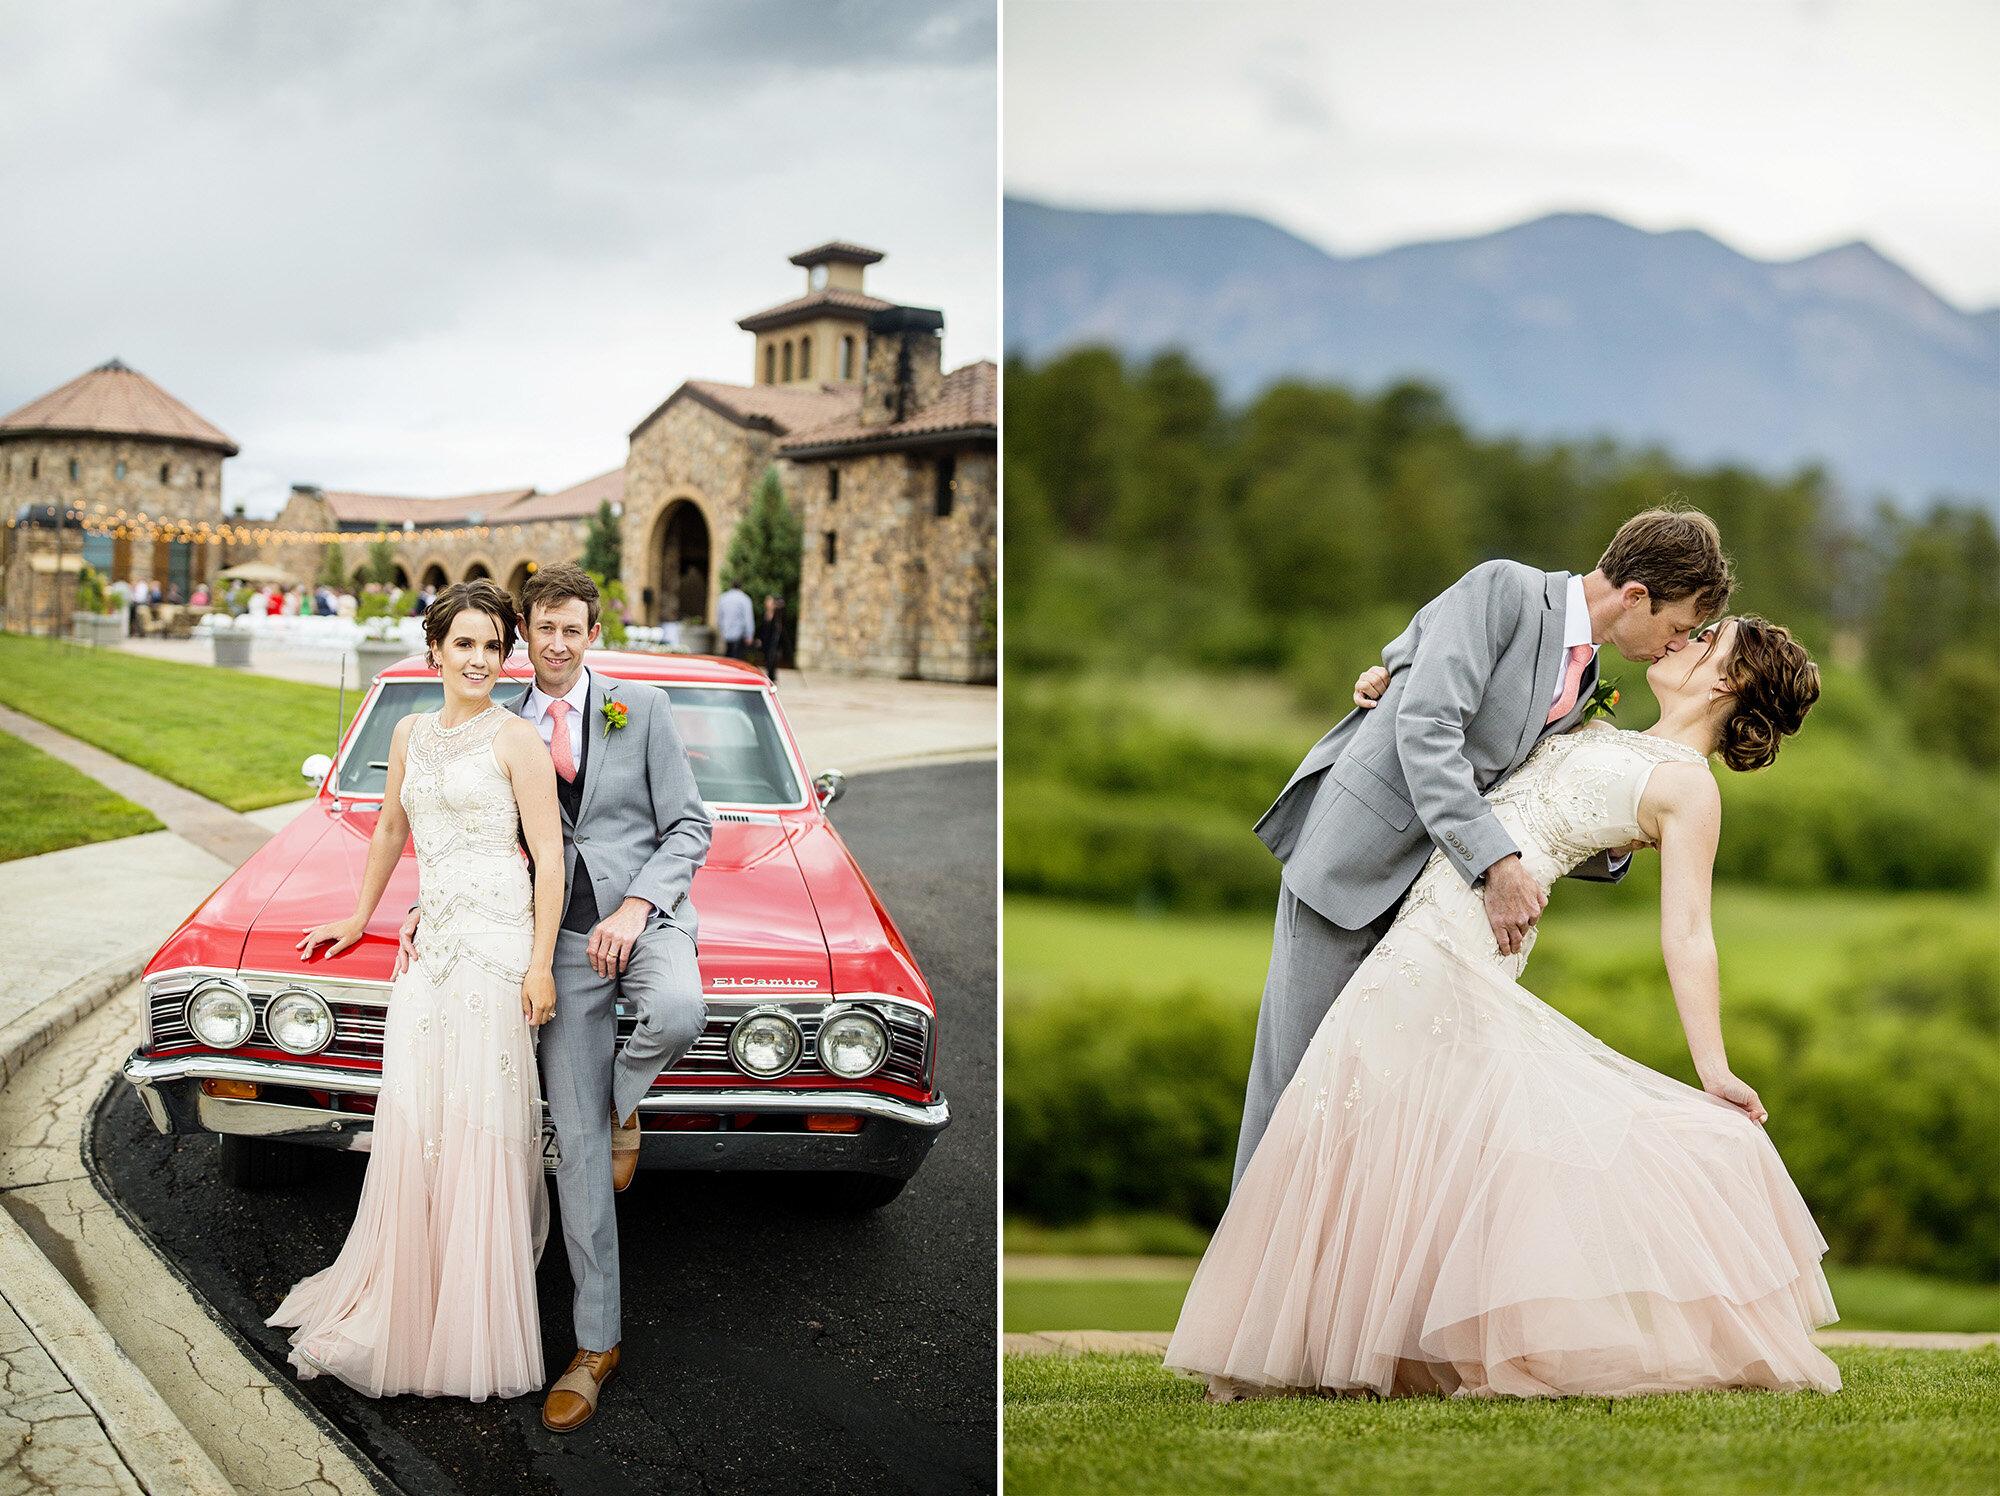 Seriously_Sabrina_Photography_Colorado_Springs_Club_at_Flying_Horse_Destination_Wedding_ODwyer79.jpg